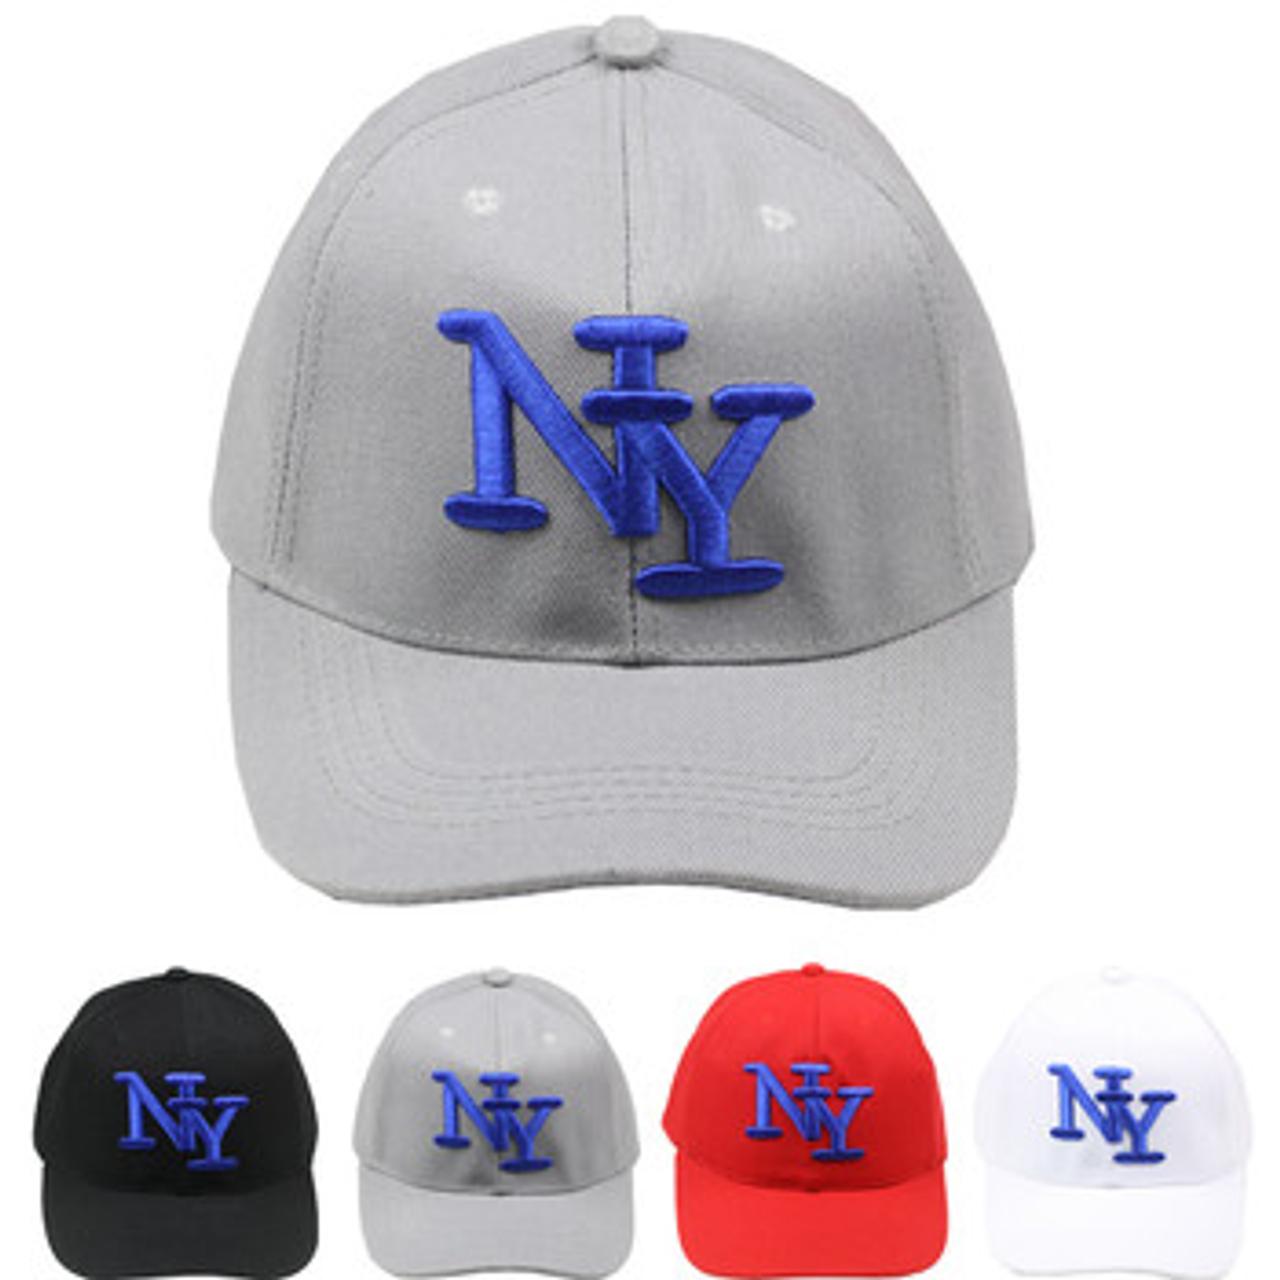 Baseball Caps 12ct.